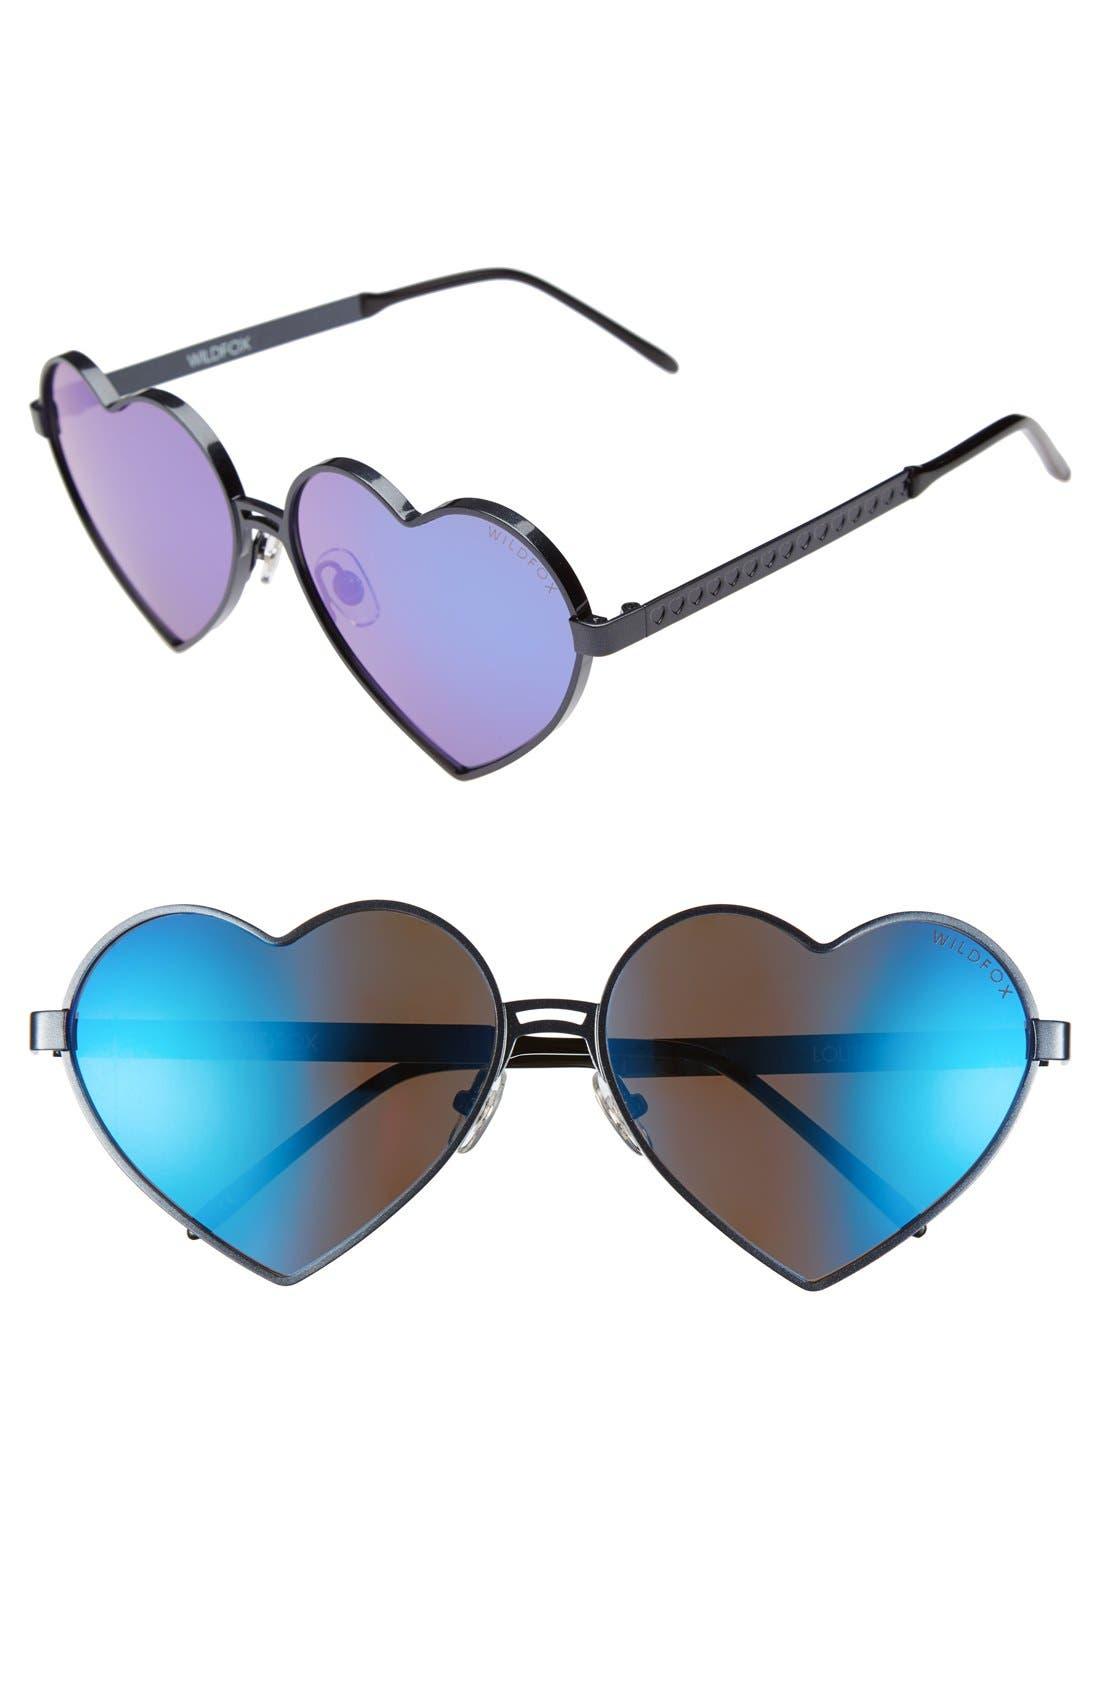 'Lolita Deluxe' 59mm Sunglasses,                             Main thumbnail 1, color,                             001